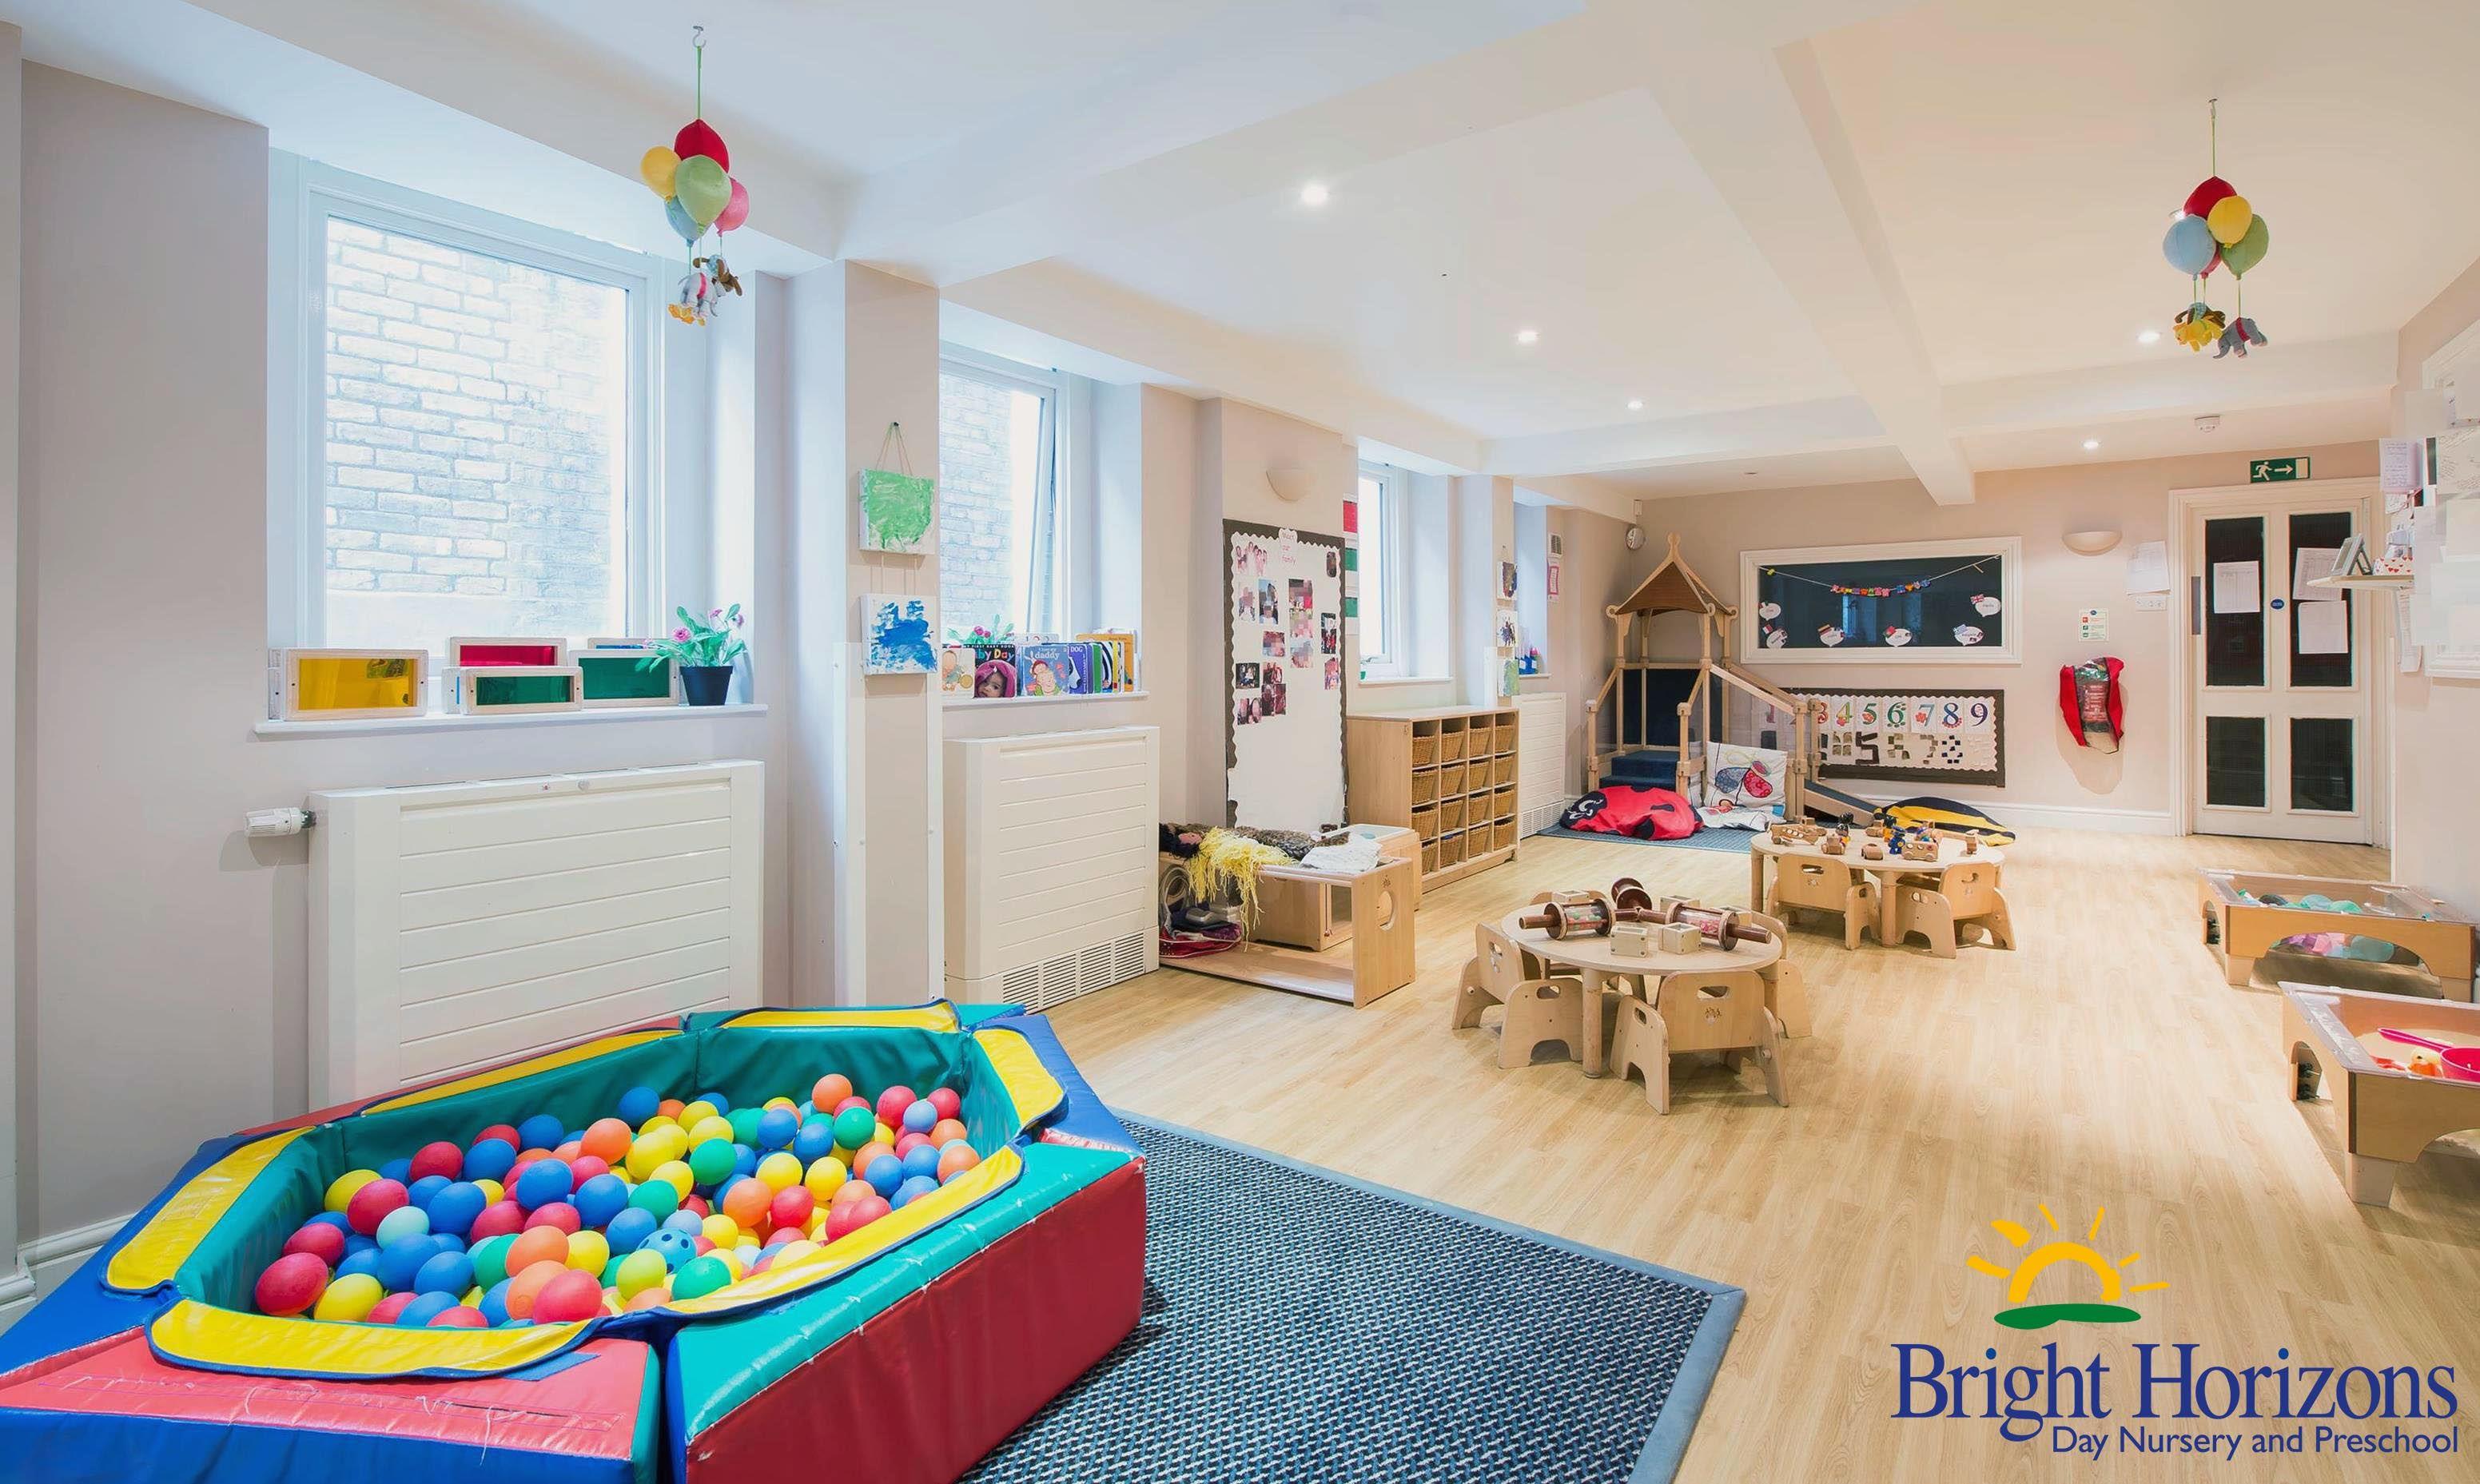 West Dulwich Day Nursery and Preschool offers a warm